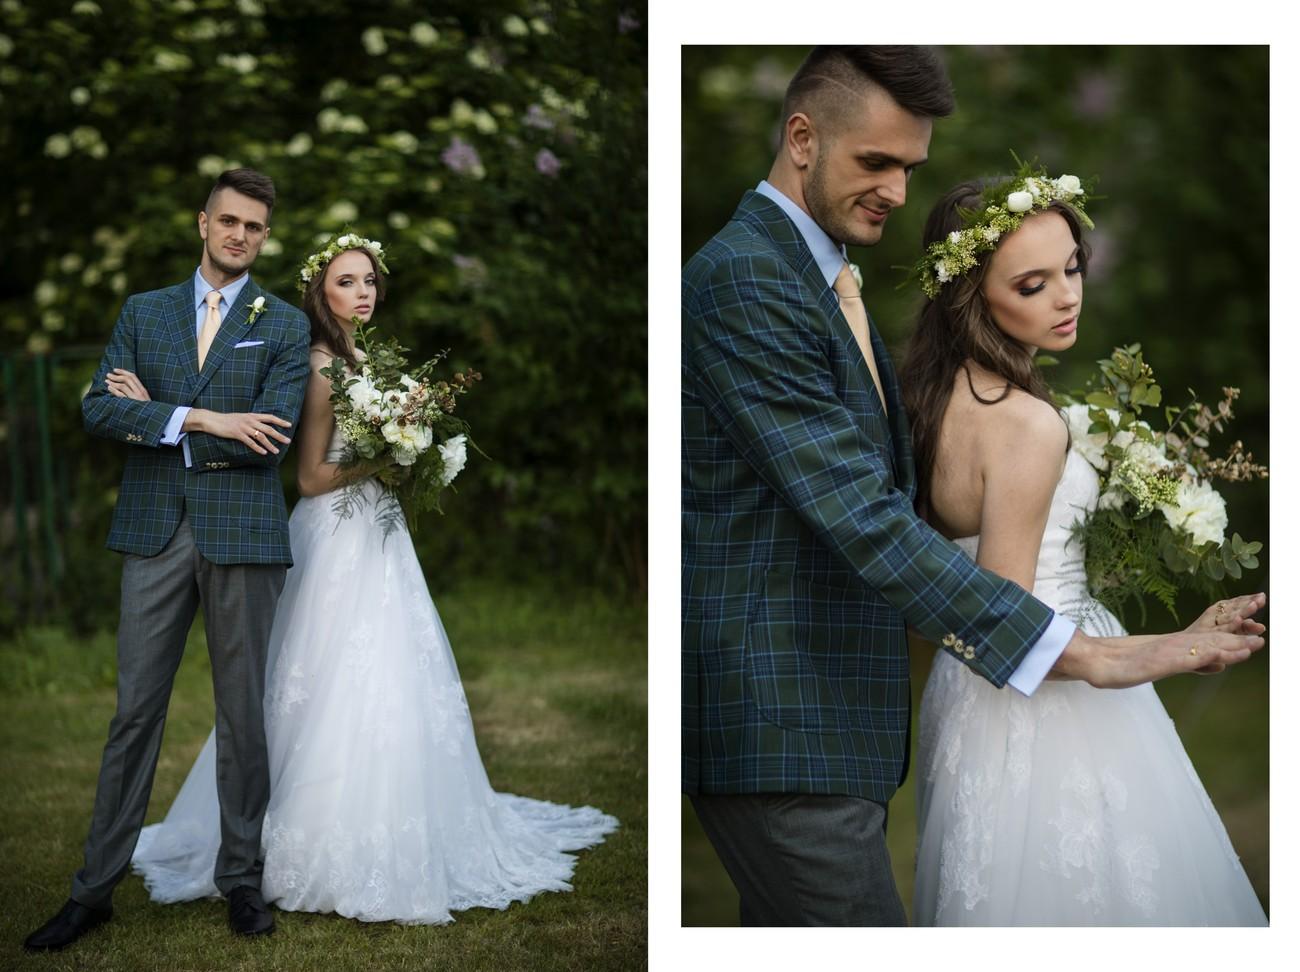 sesja ślubna stroje i biżuteria